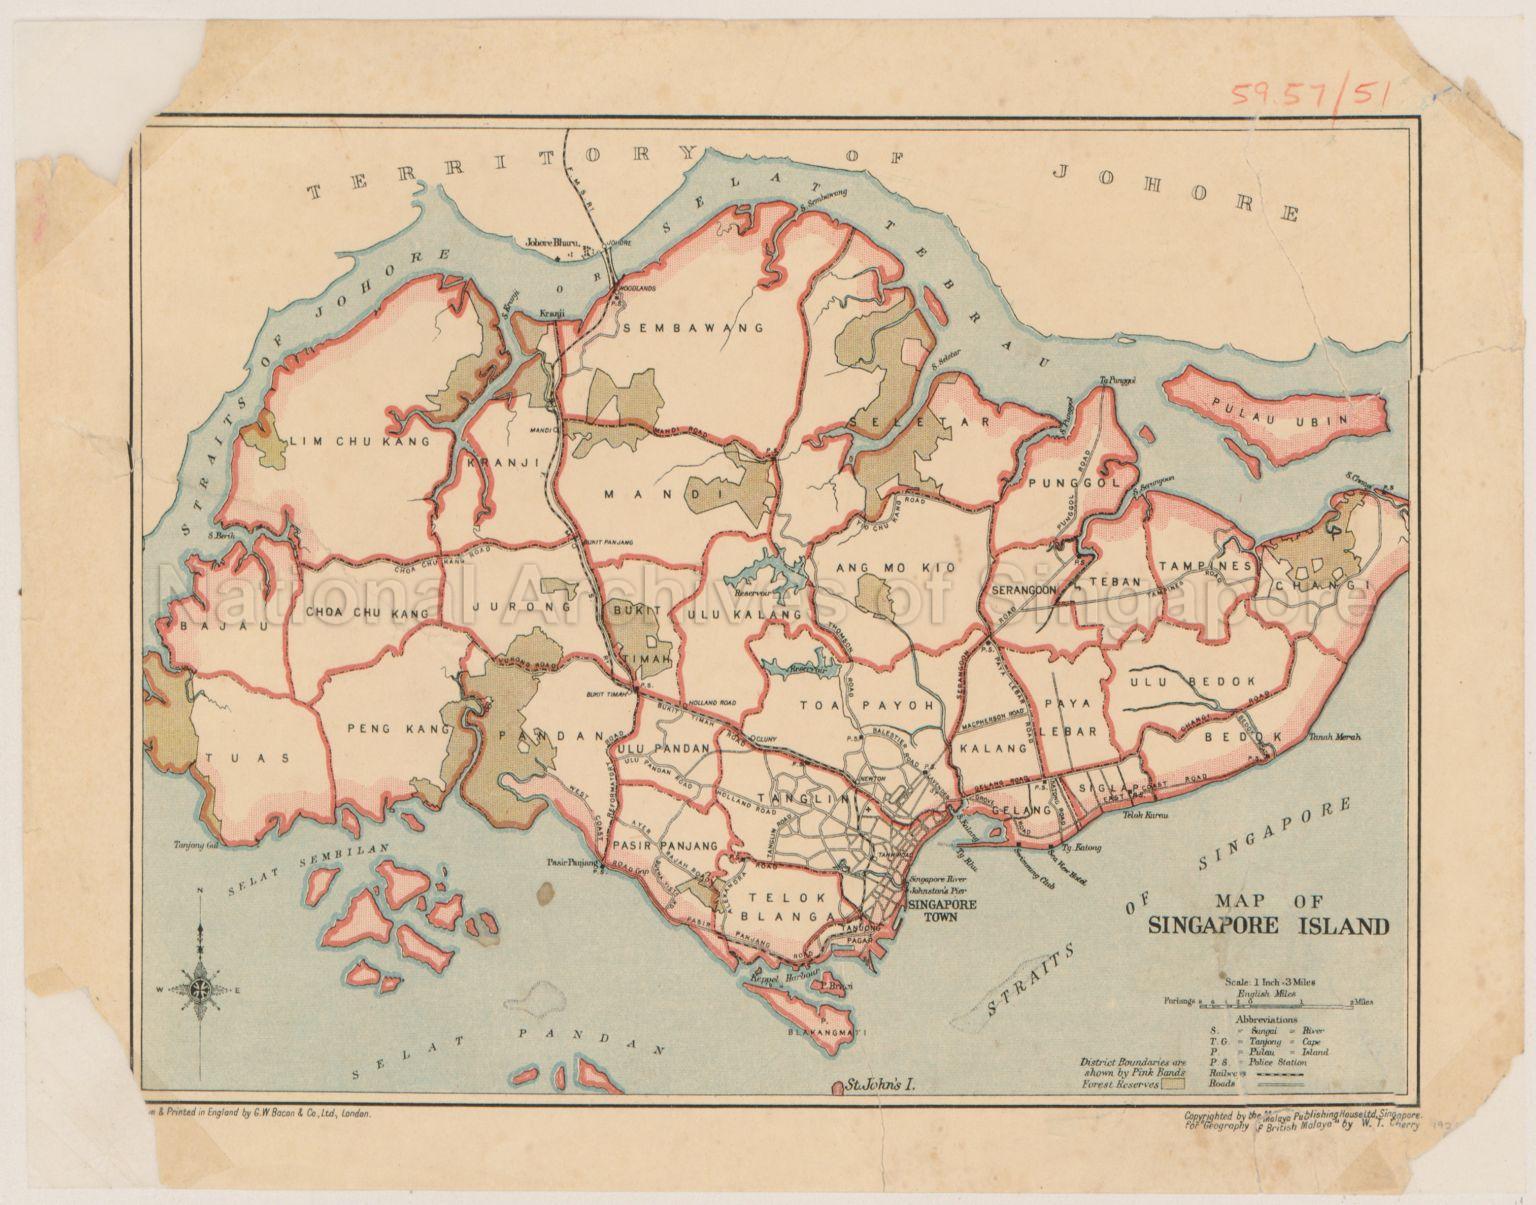 Map Of Singapore Island - Singapore map